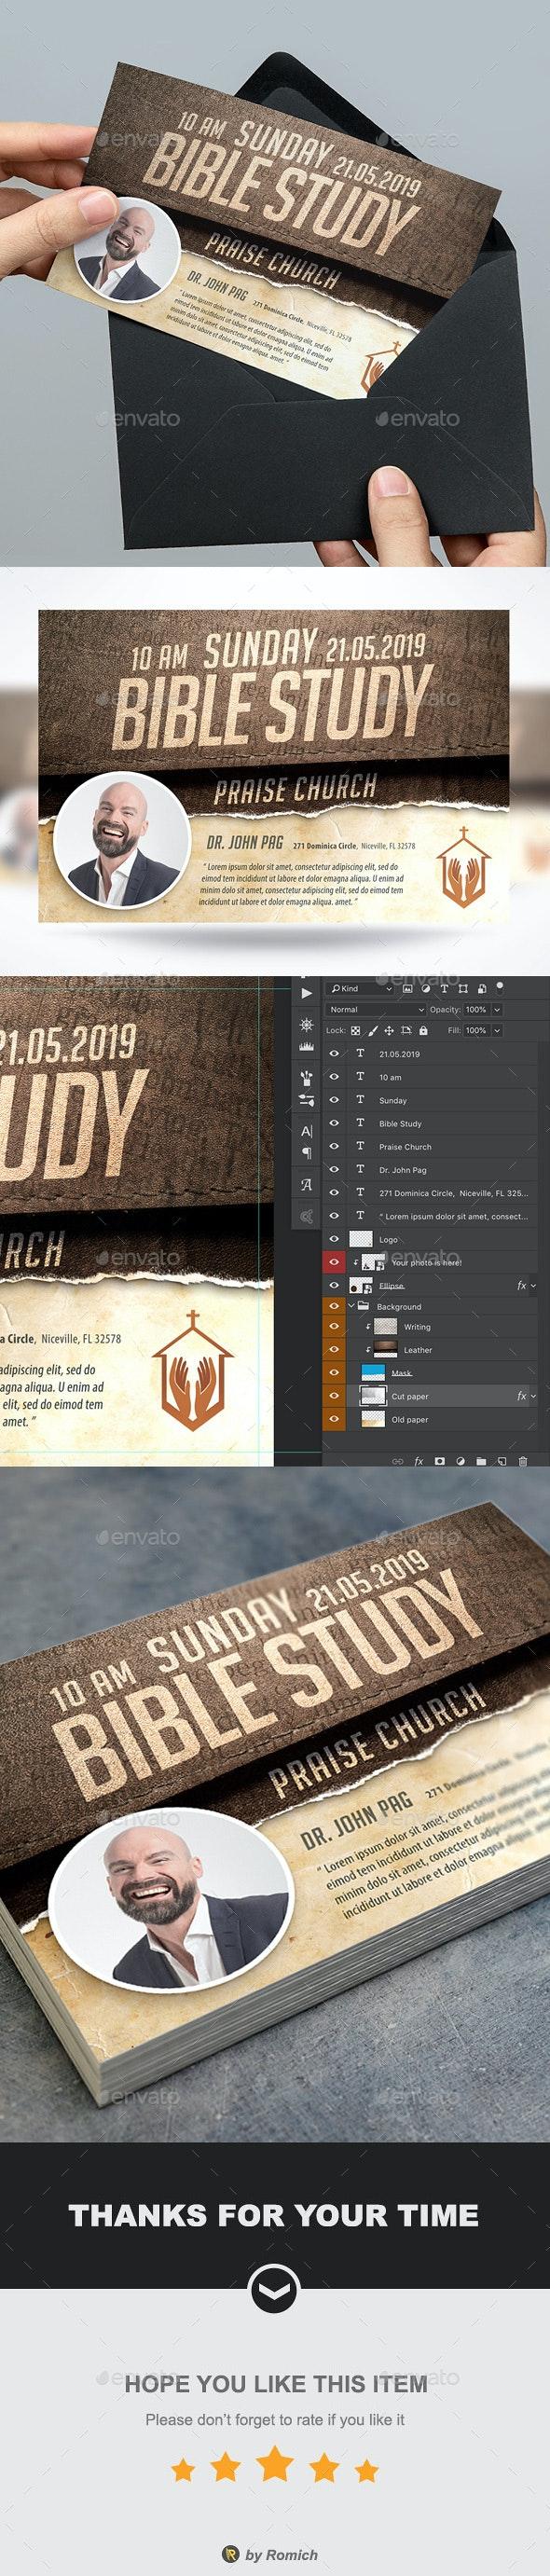 Bible Study Church Flyer - Church Flyers